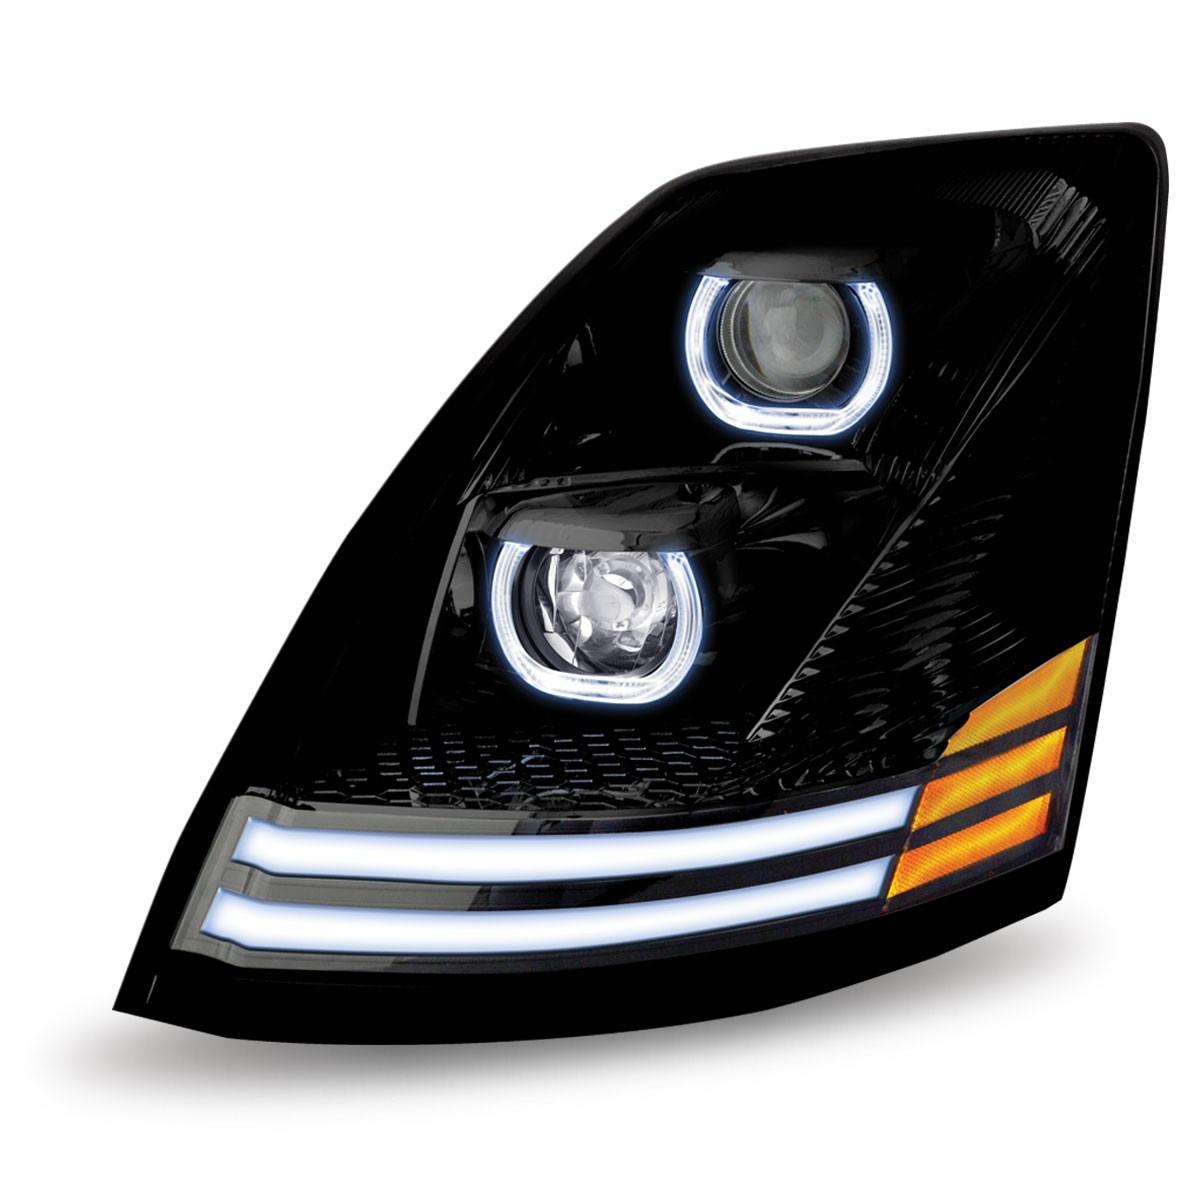 Volvo VNL Black Headlight Driver Side 2004 & Up | eBay  |Headlamp 2000 Volvo Vnl